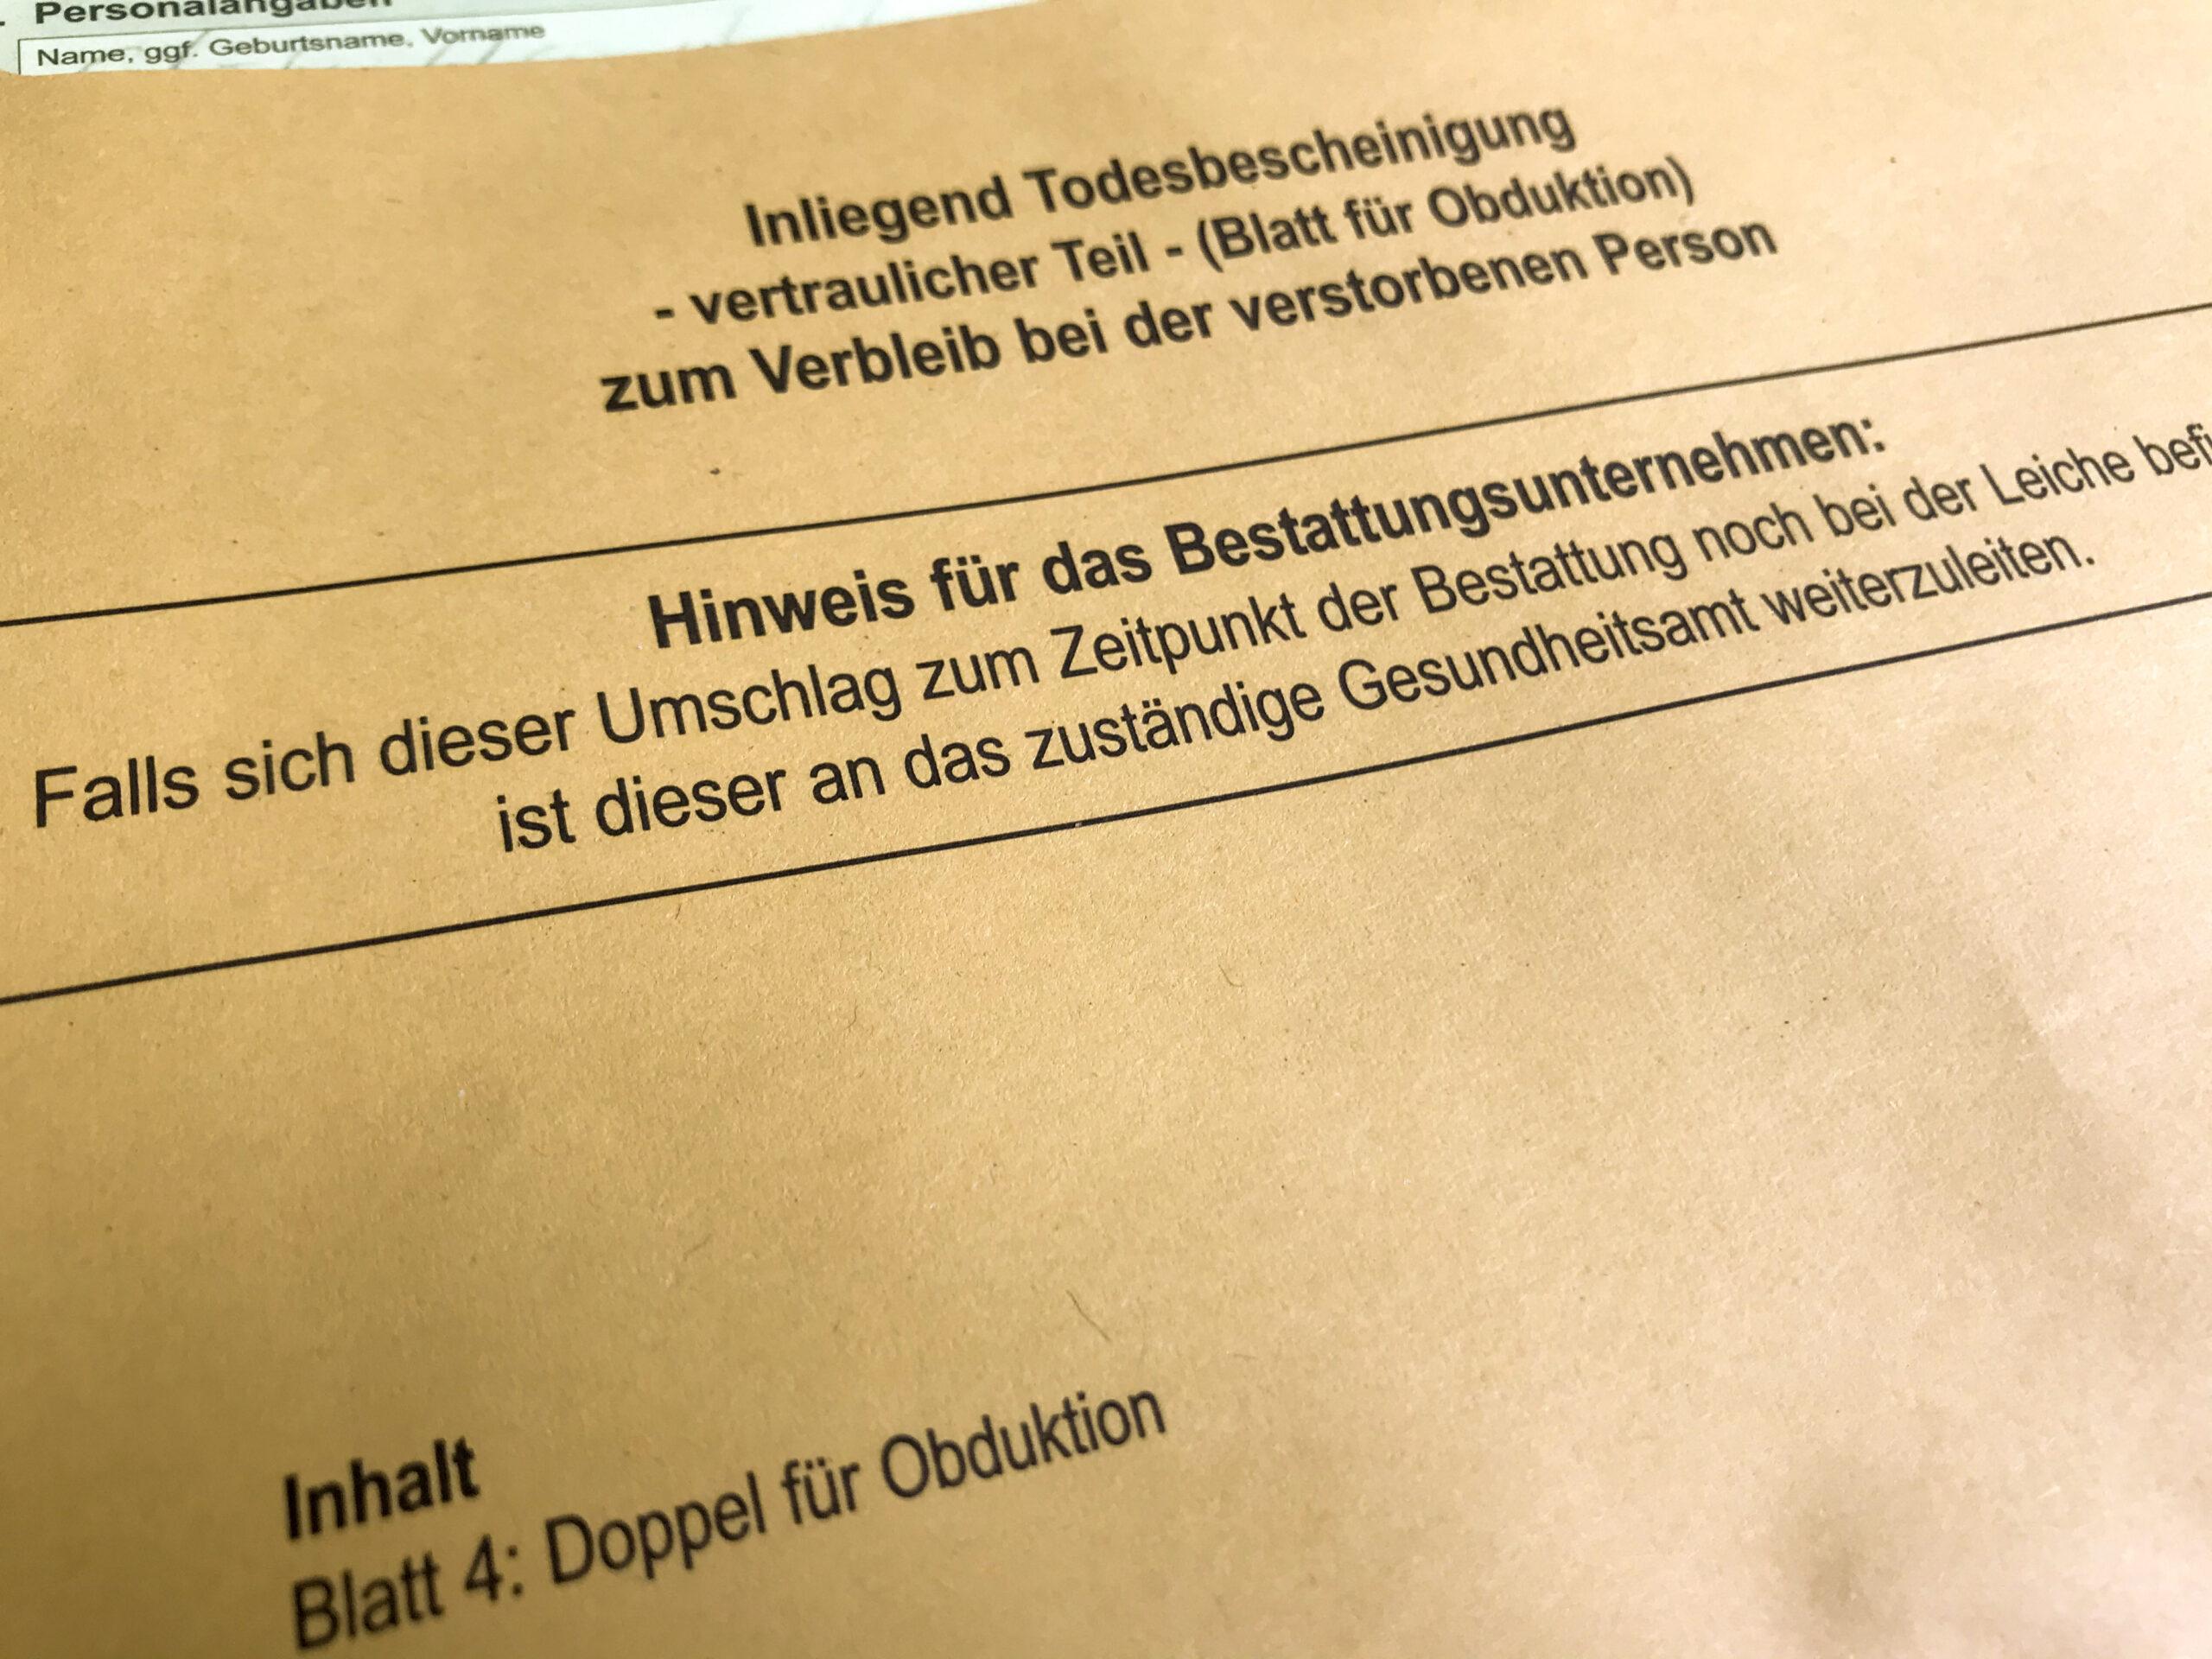 Todesbescheinigung Gelbes Kuvert